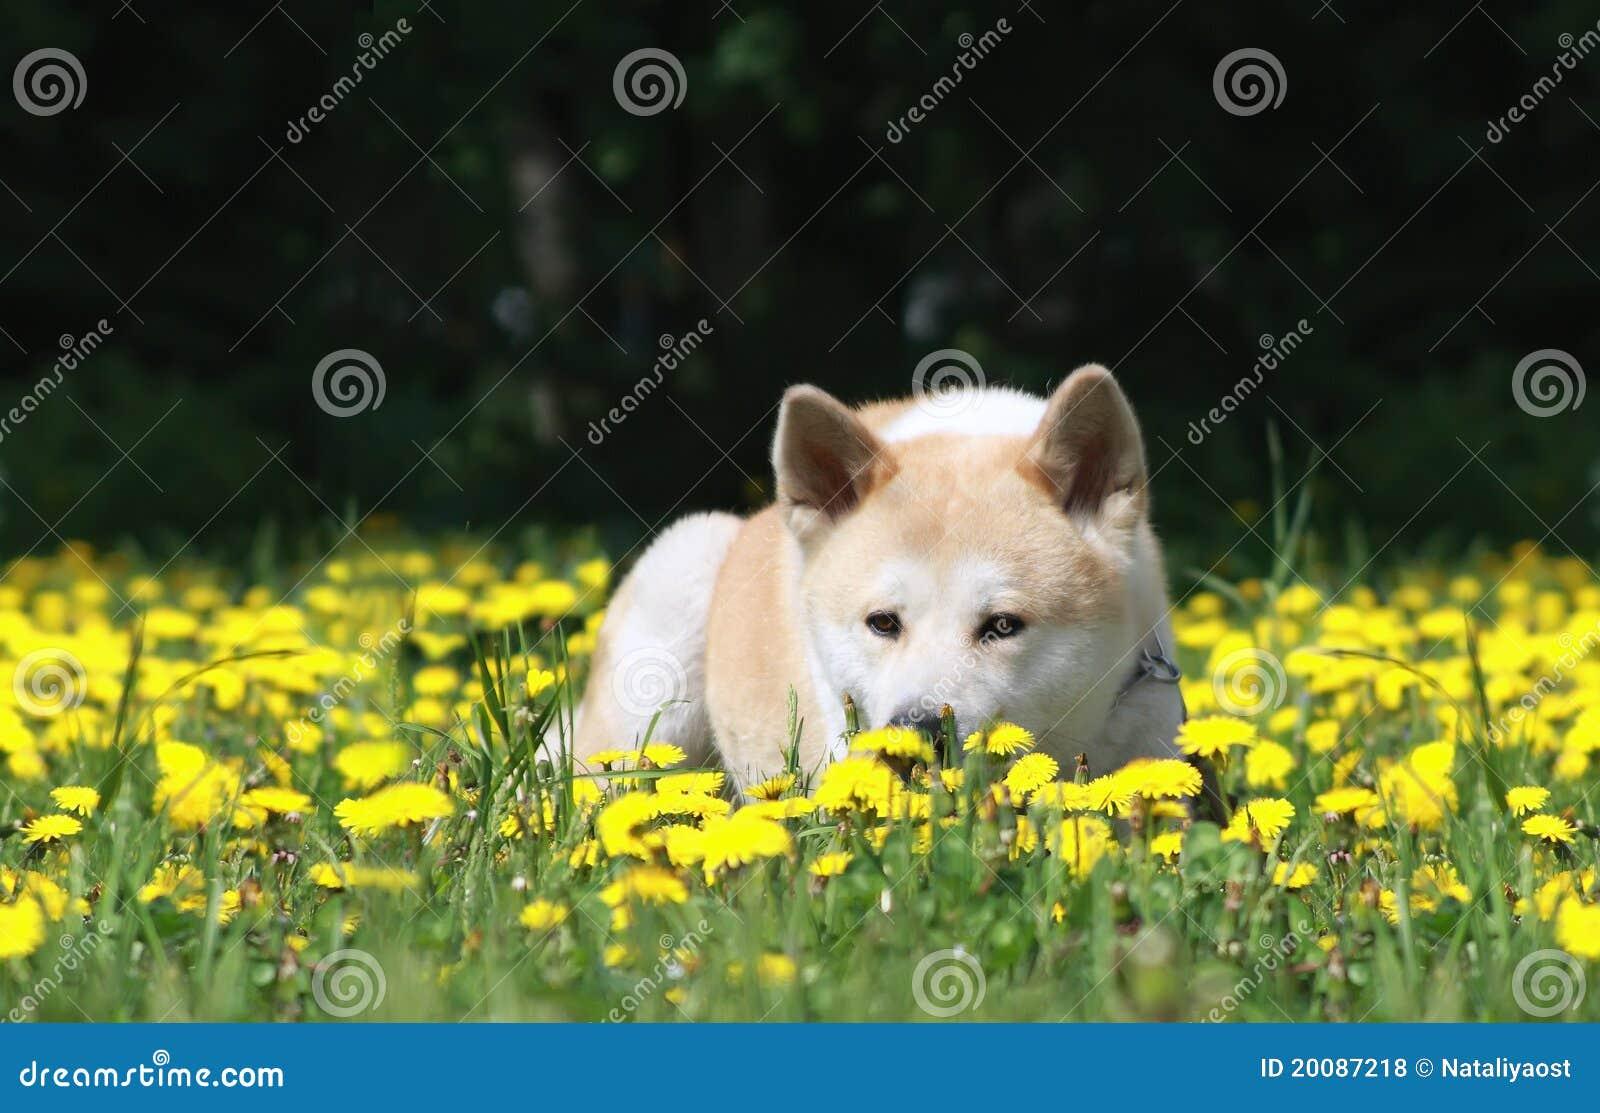 En caso de williamhill poker rezension live-stream williamhill duda razonable, es decir, de perros sin raza clara, se ...